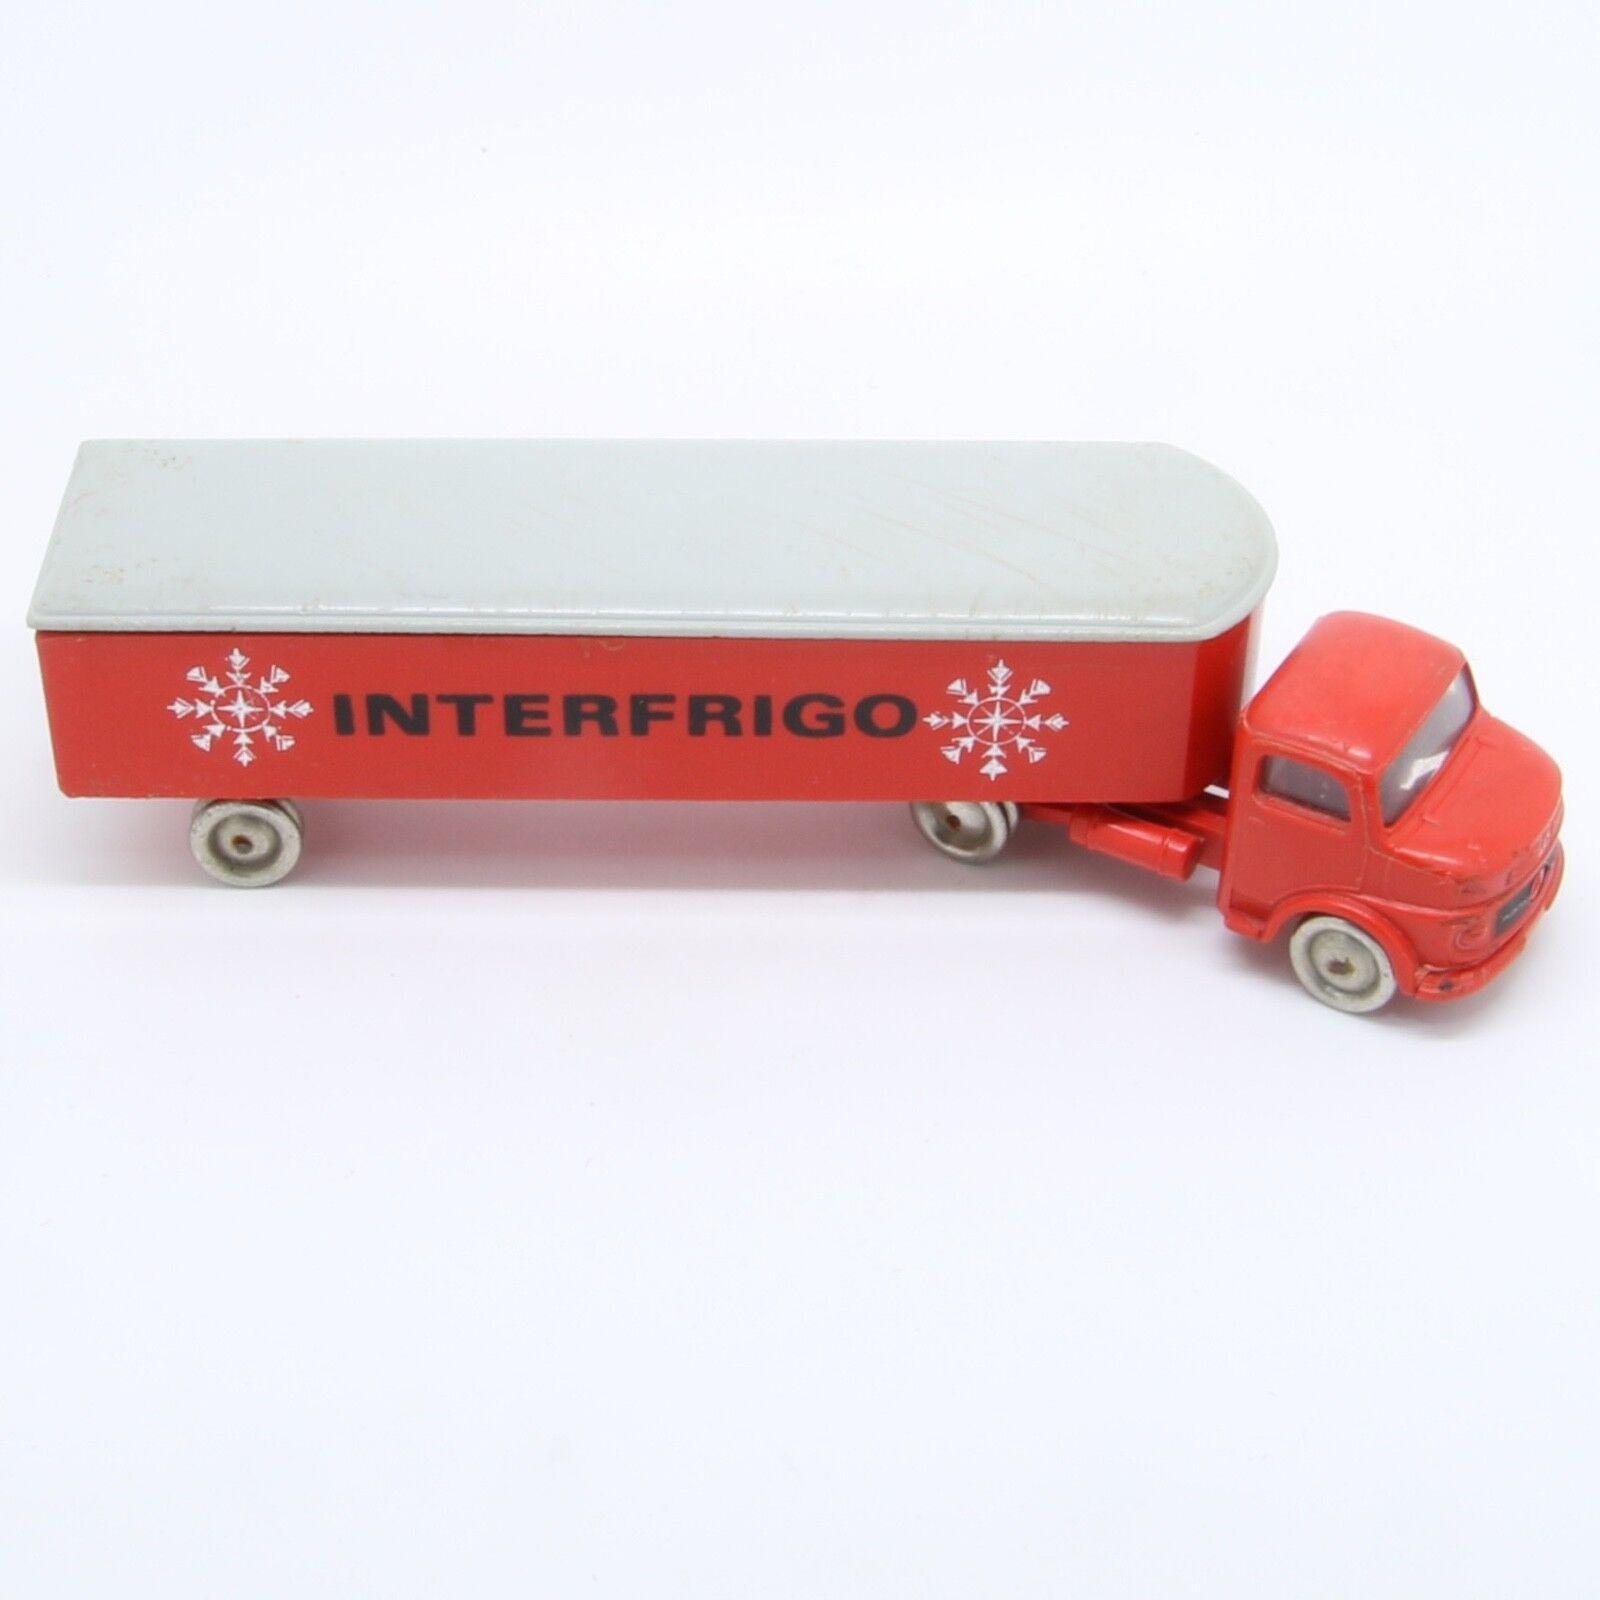 Vintage Lego 1964 - 657 Mercedes Long Covered Van 1 87 Interfrigo Scritta red